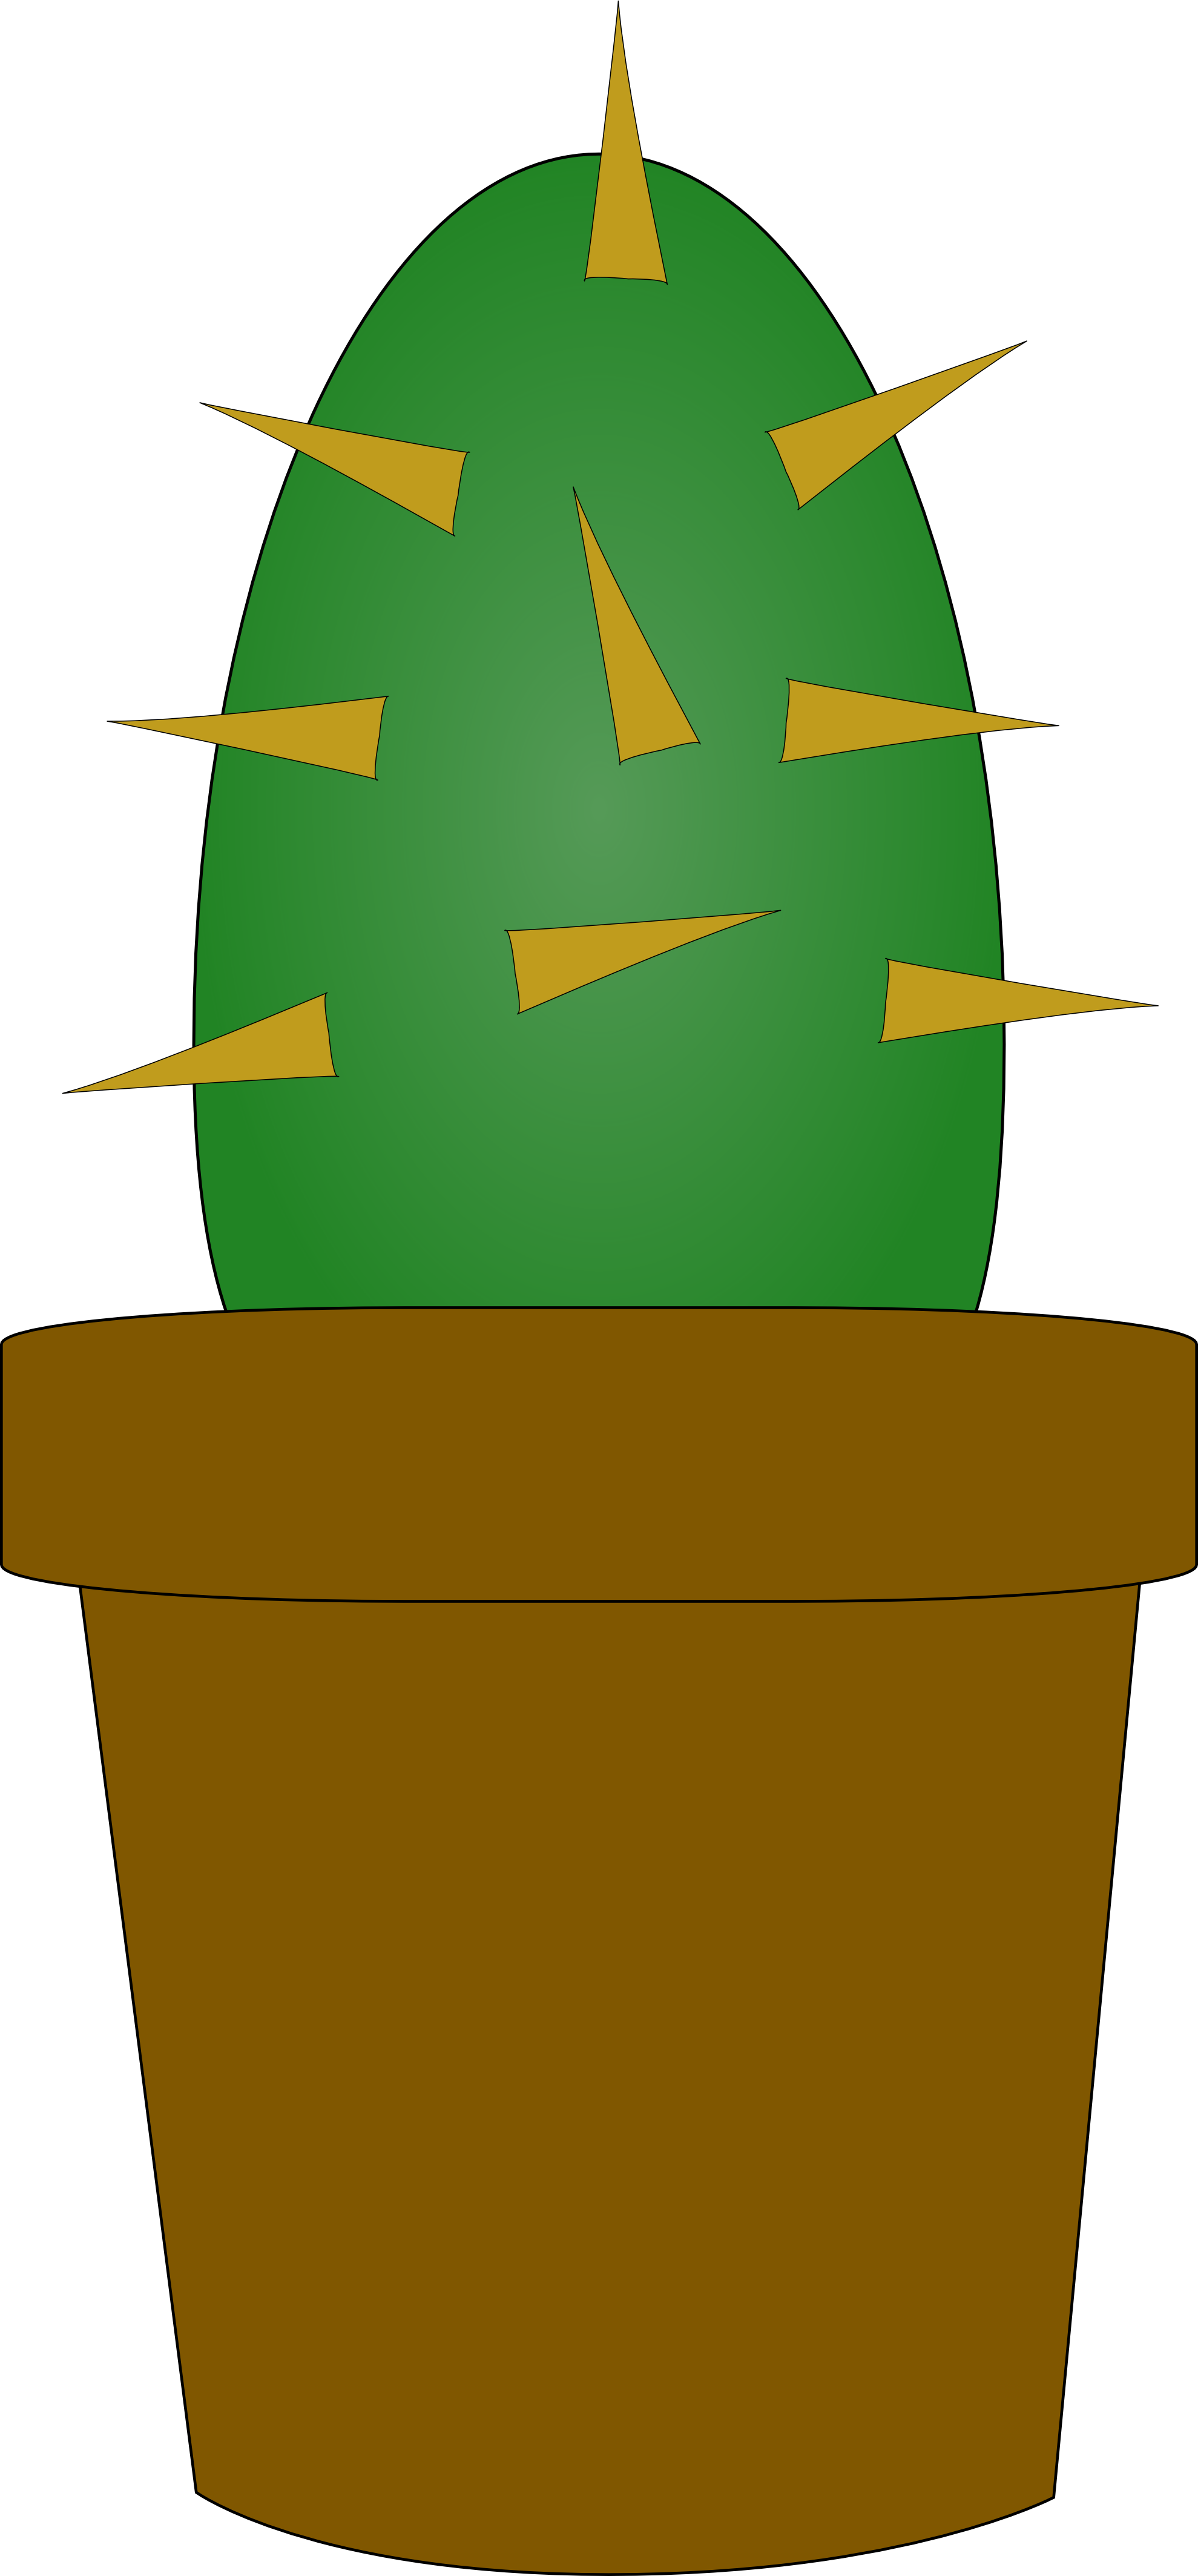 Clipart tree cactus. Clipartist net clip art